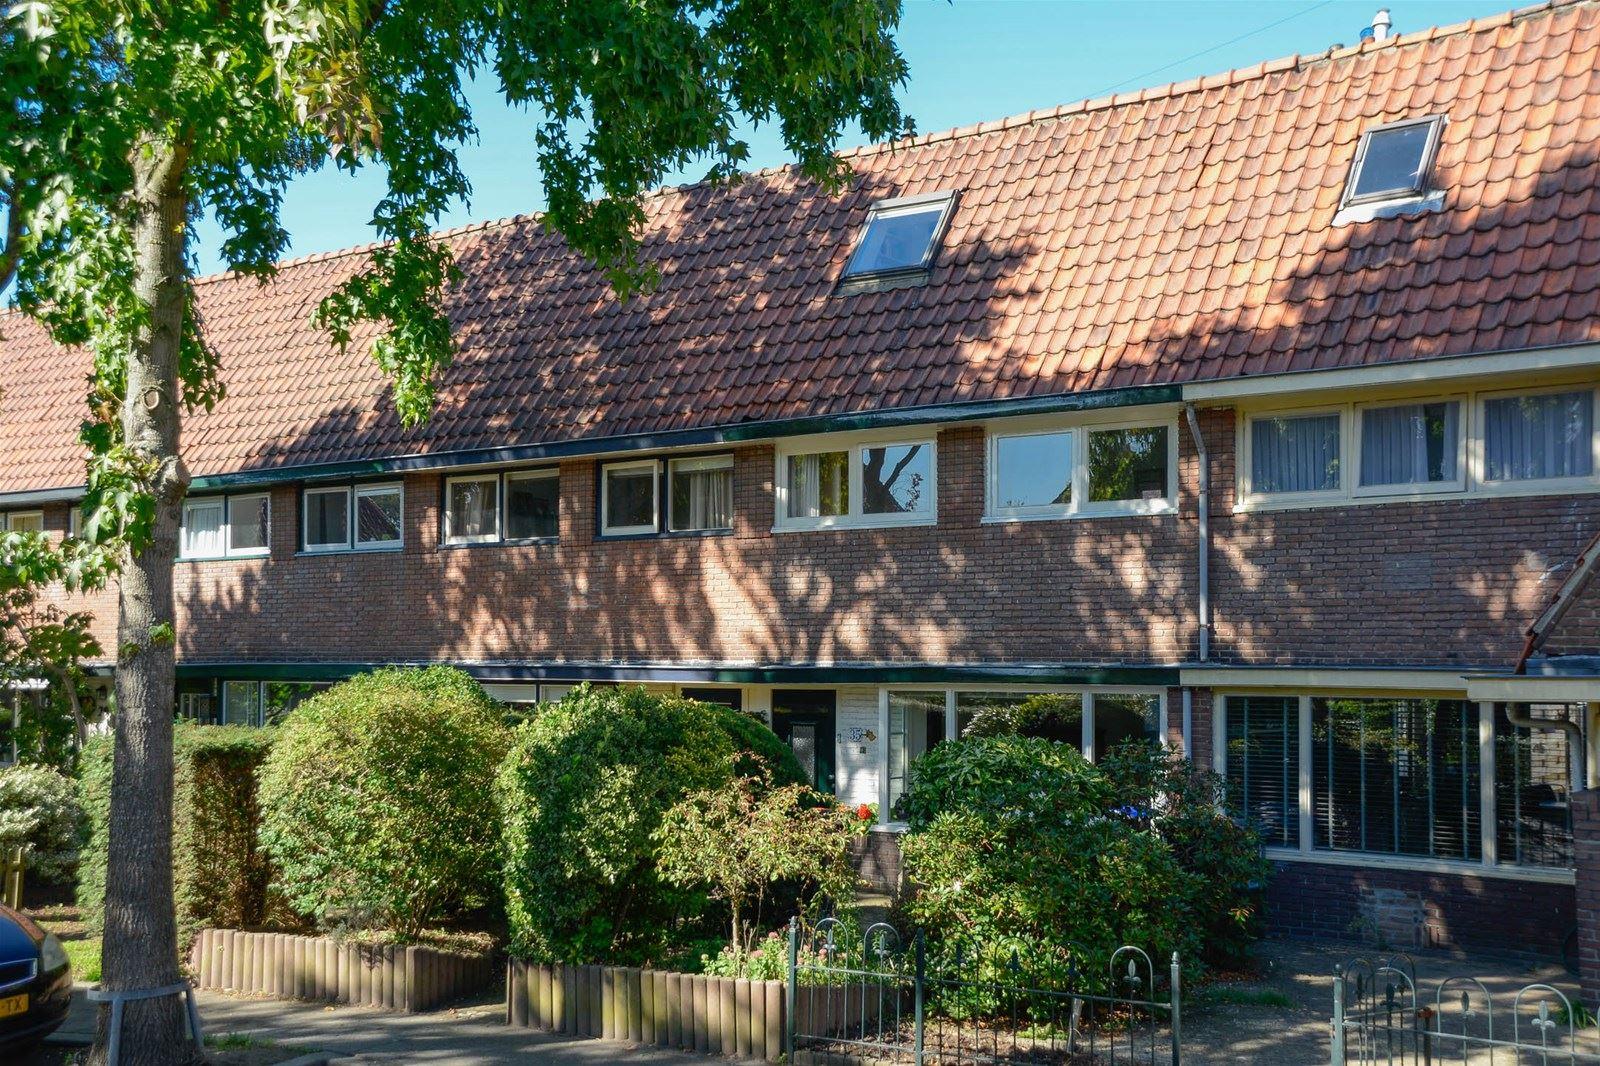 Huis te koop professor dondersstraat 35 1221 hm hilversum for Huis hilversum